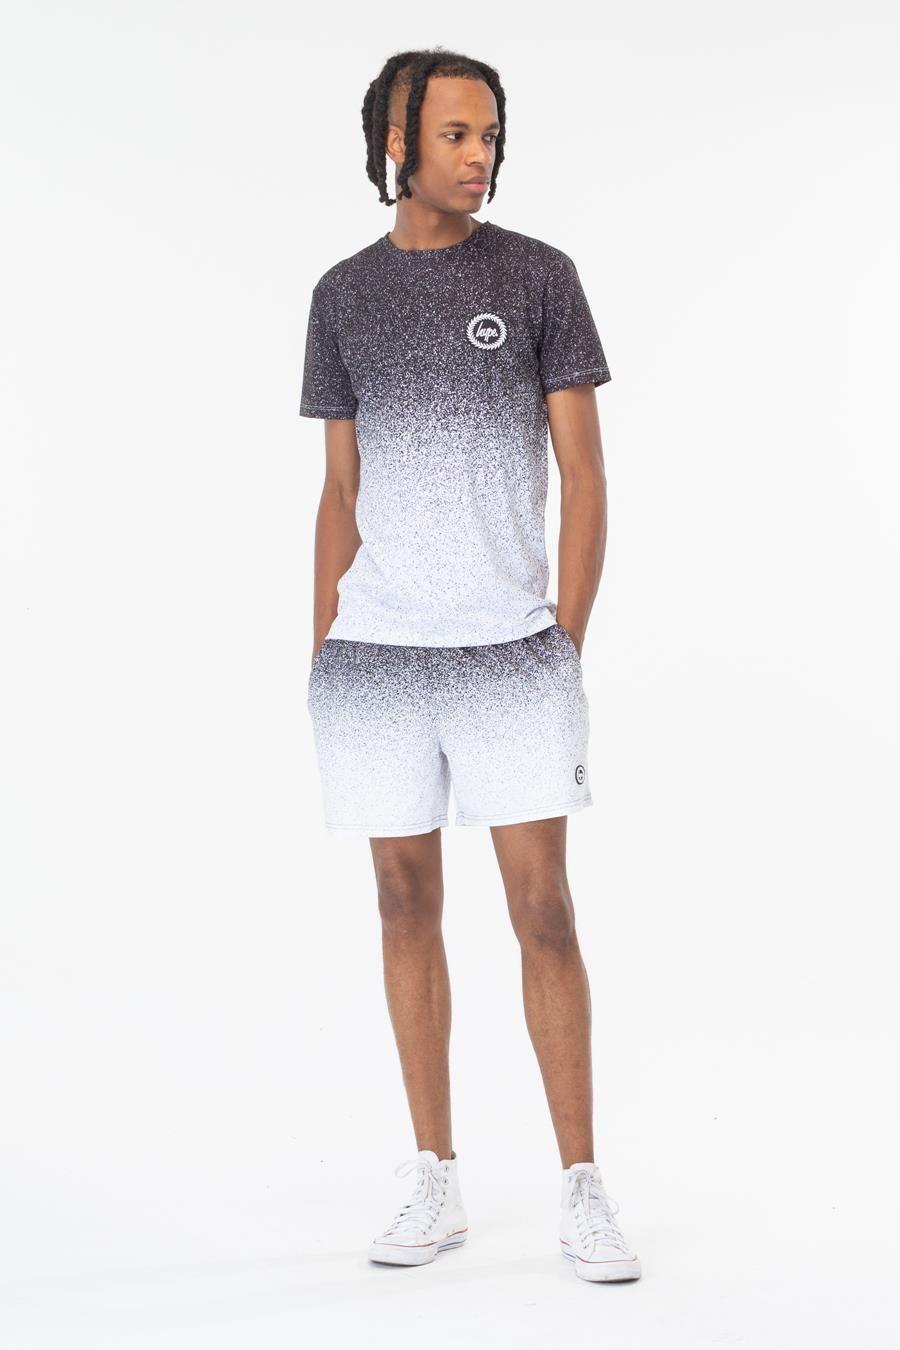 Hype Speckle Fade Mens Swim Shorts